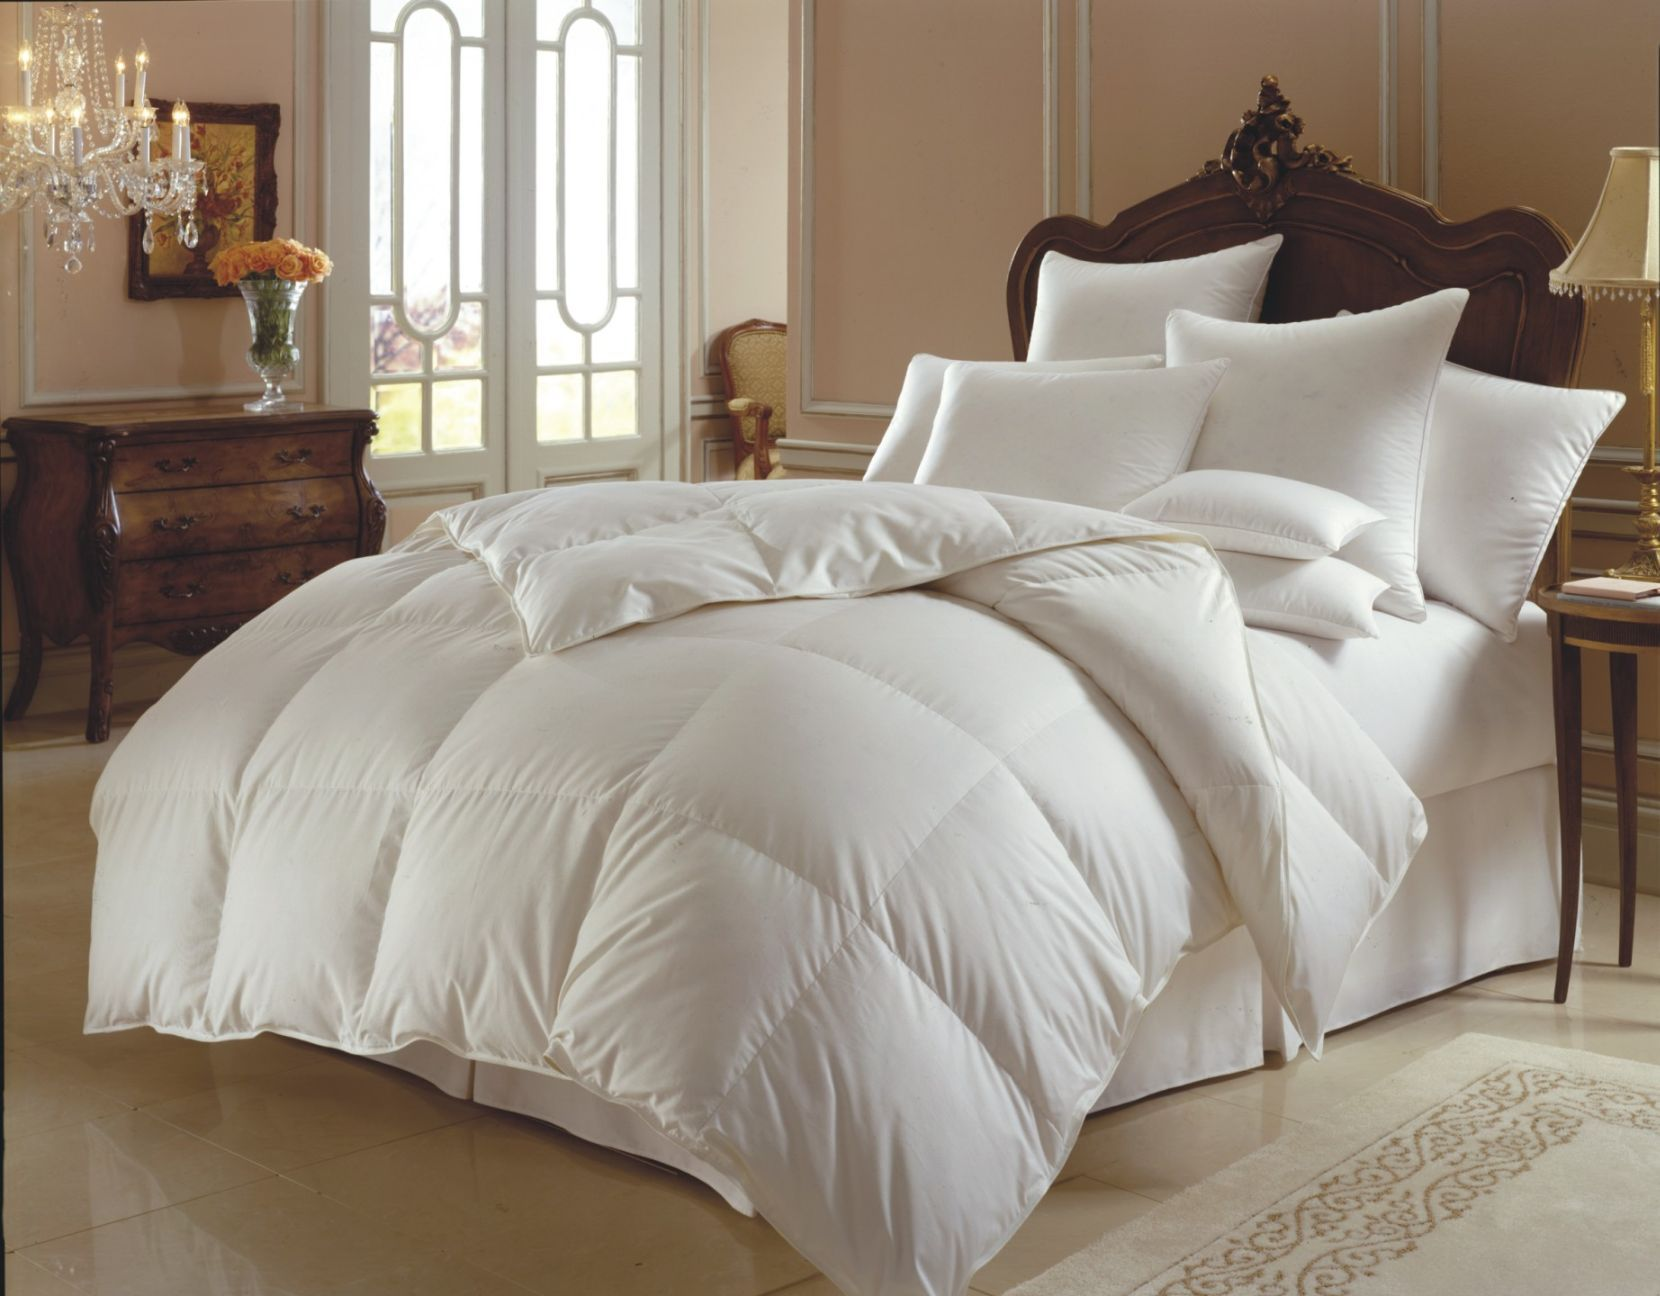 Google Image Result For Http Www Downcomforterworld Com Files 2138923 Uploaded Mirage 2520comforter Jpg White Down Comforter Down Comforter White Comforter